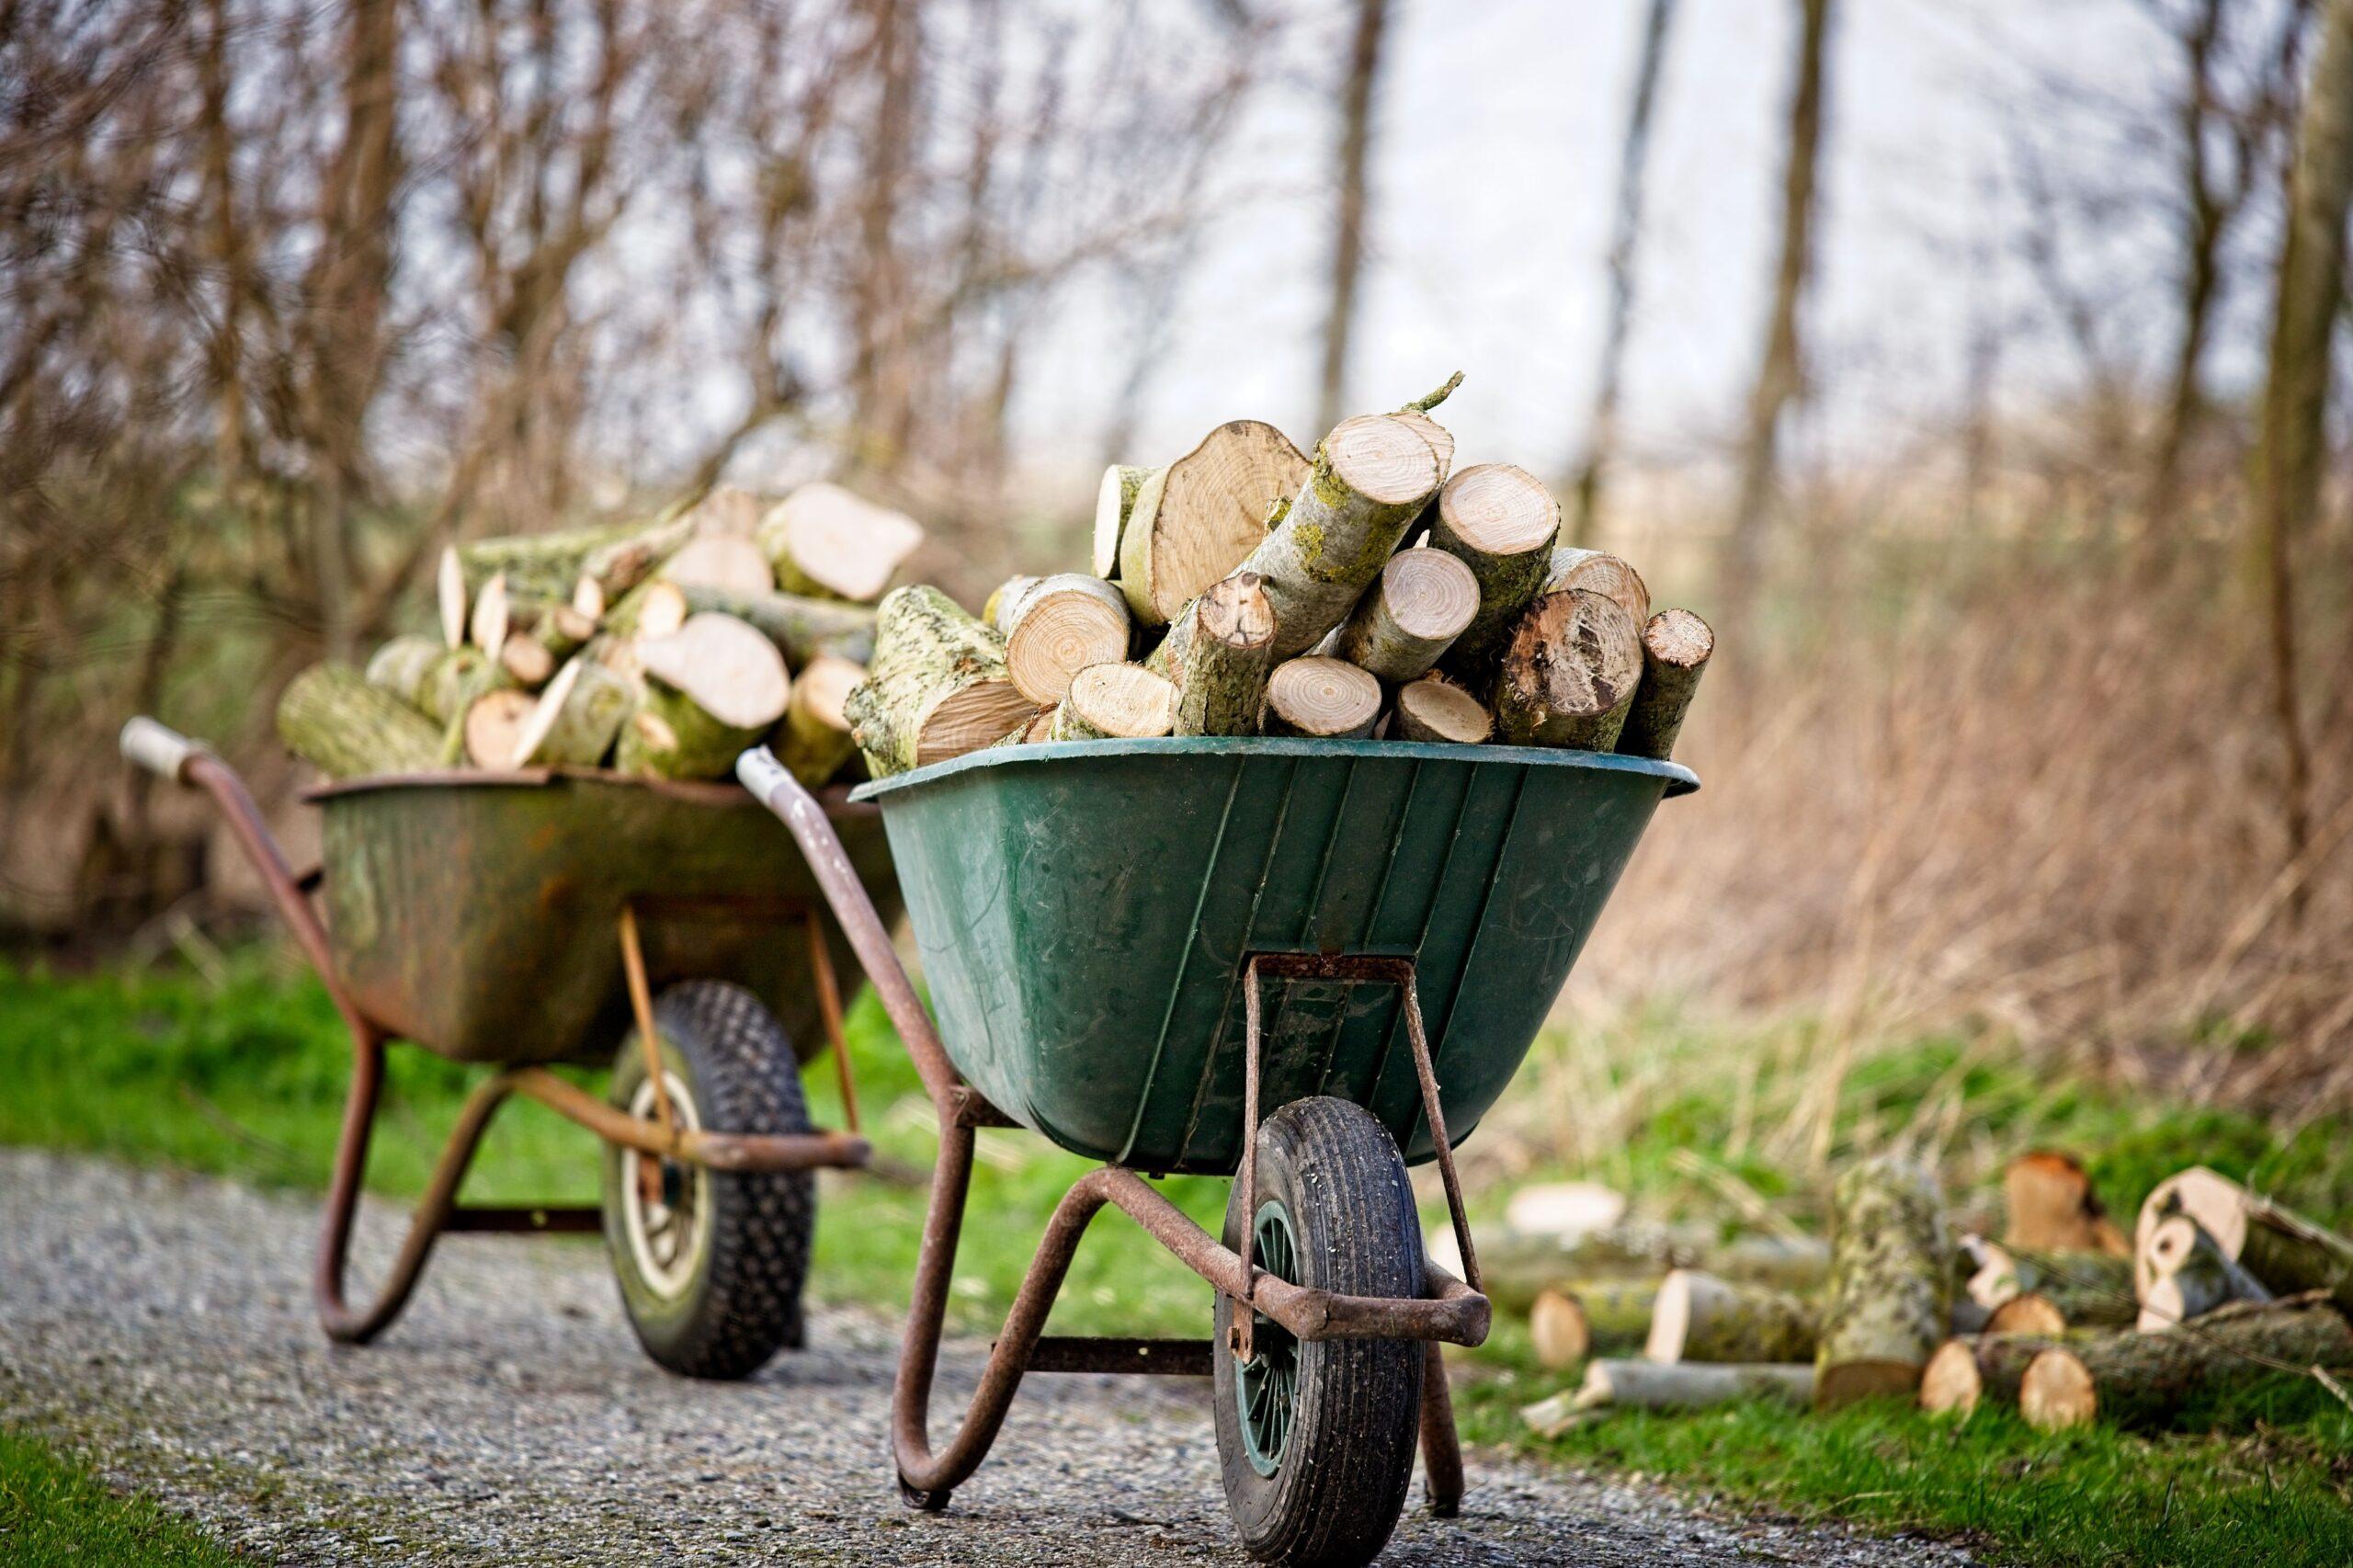 wheelbarrow-4845055